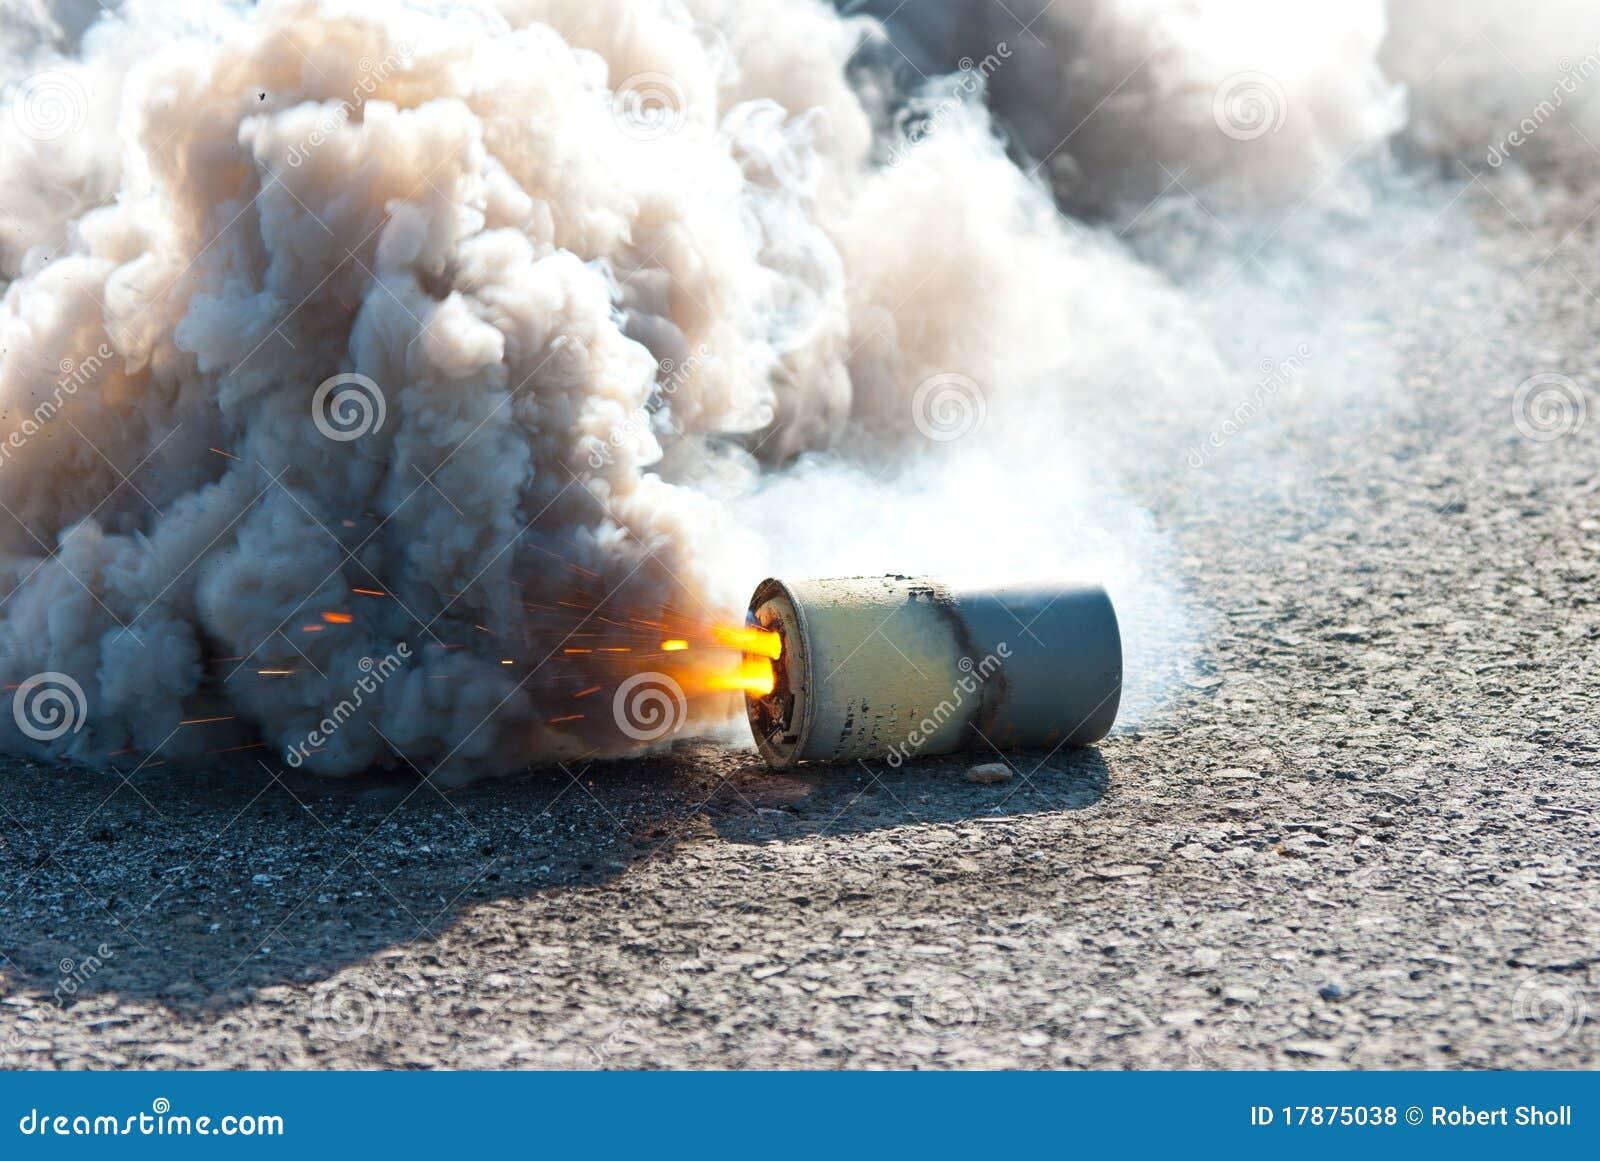 M8 Hc Smoke Grenade Royalty Free Stock Photos Image